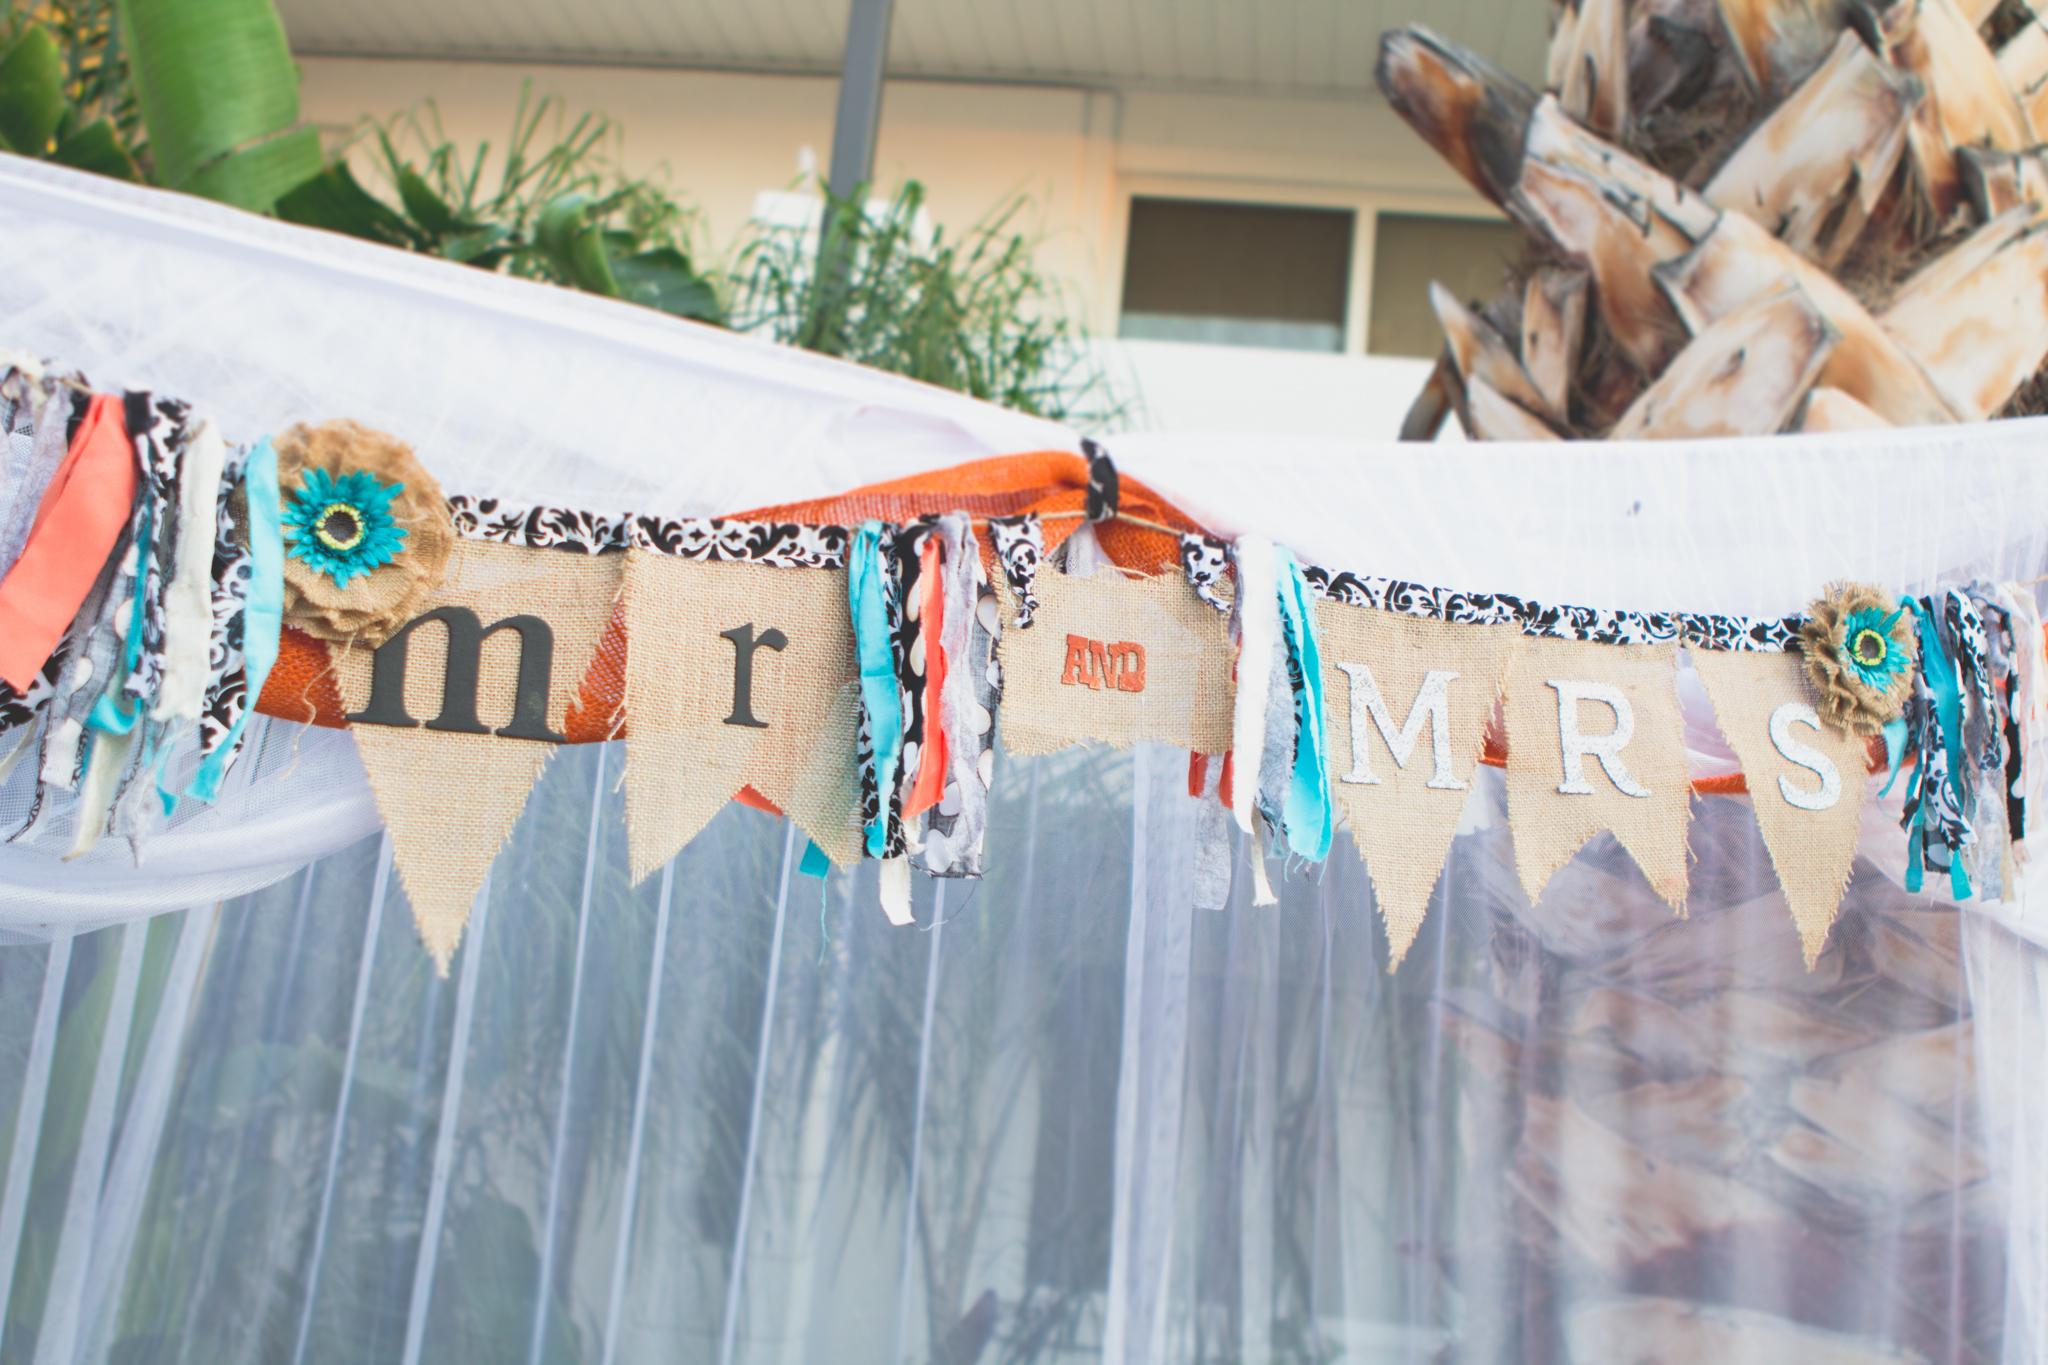 arizona-wedding-photography-mr-and-mrs-sign